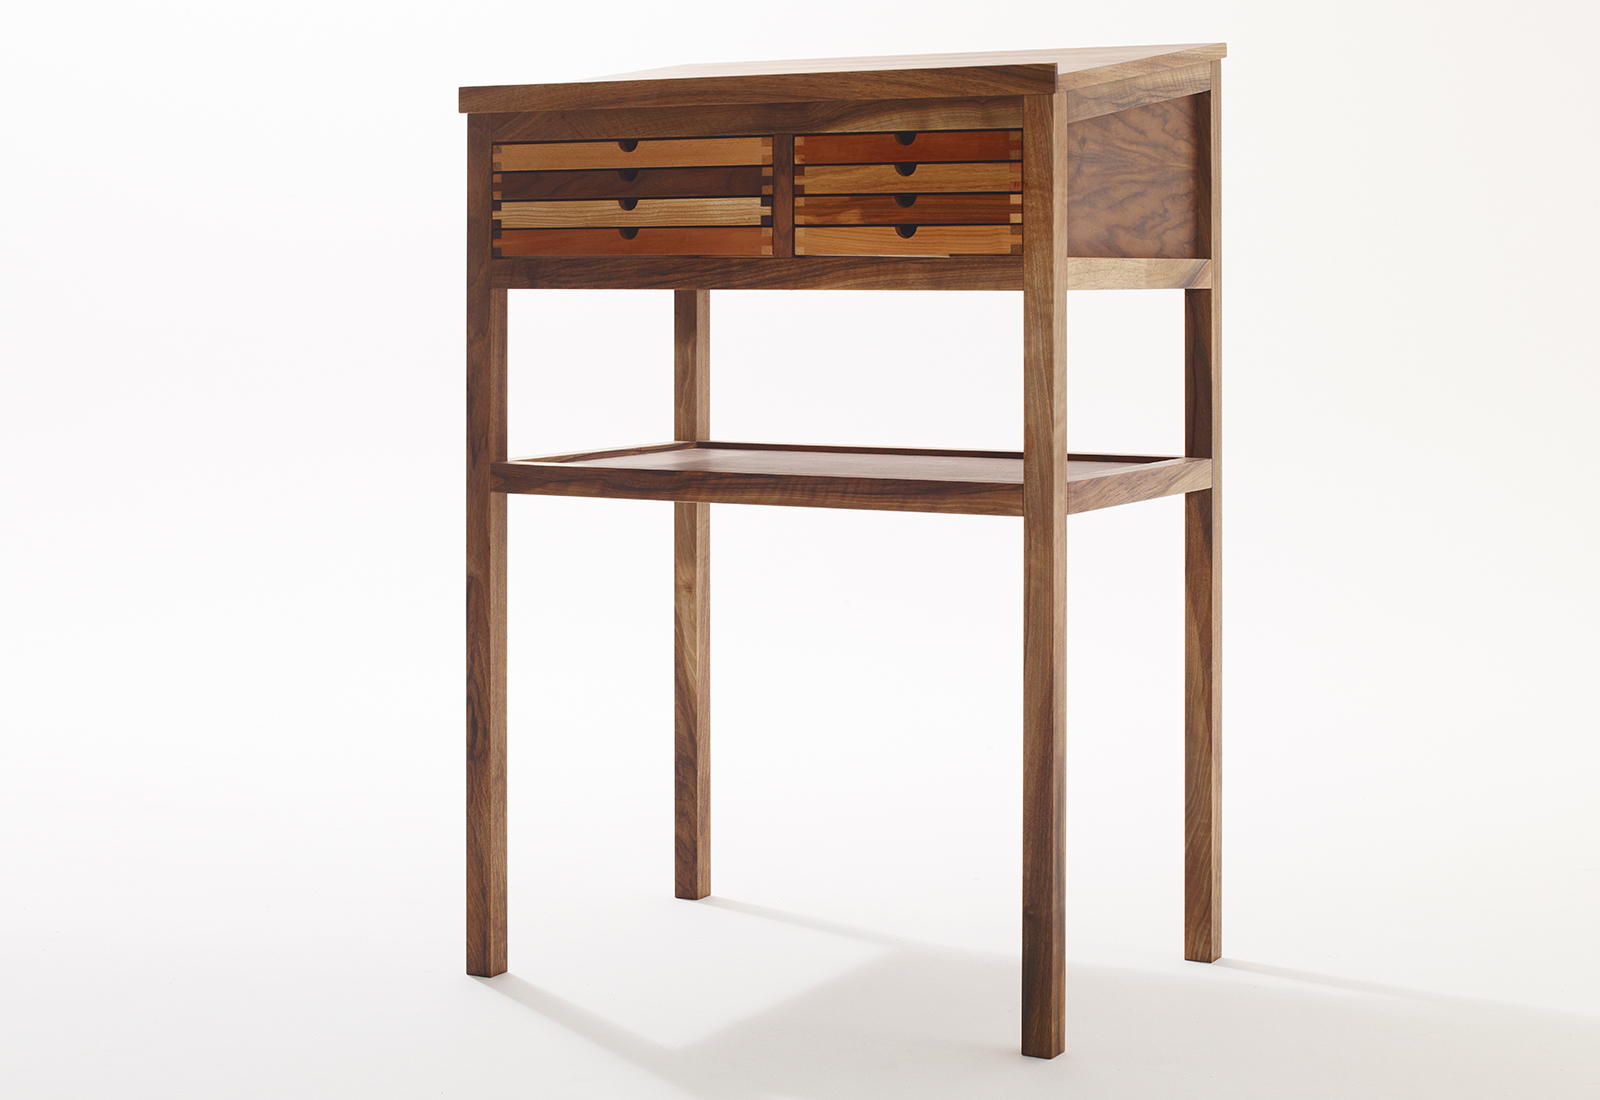 Standing desk1 - classic